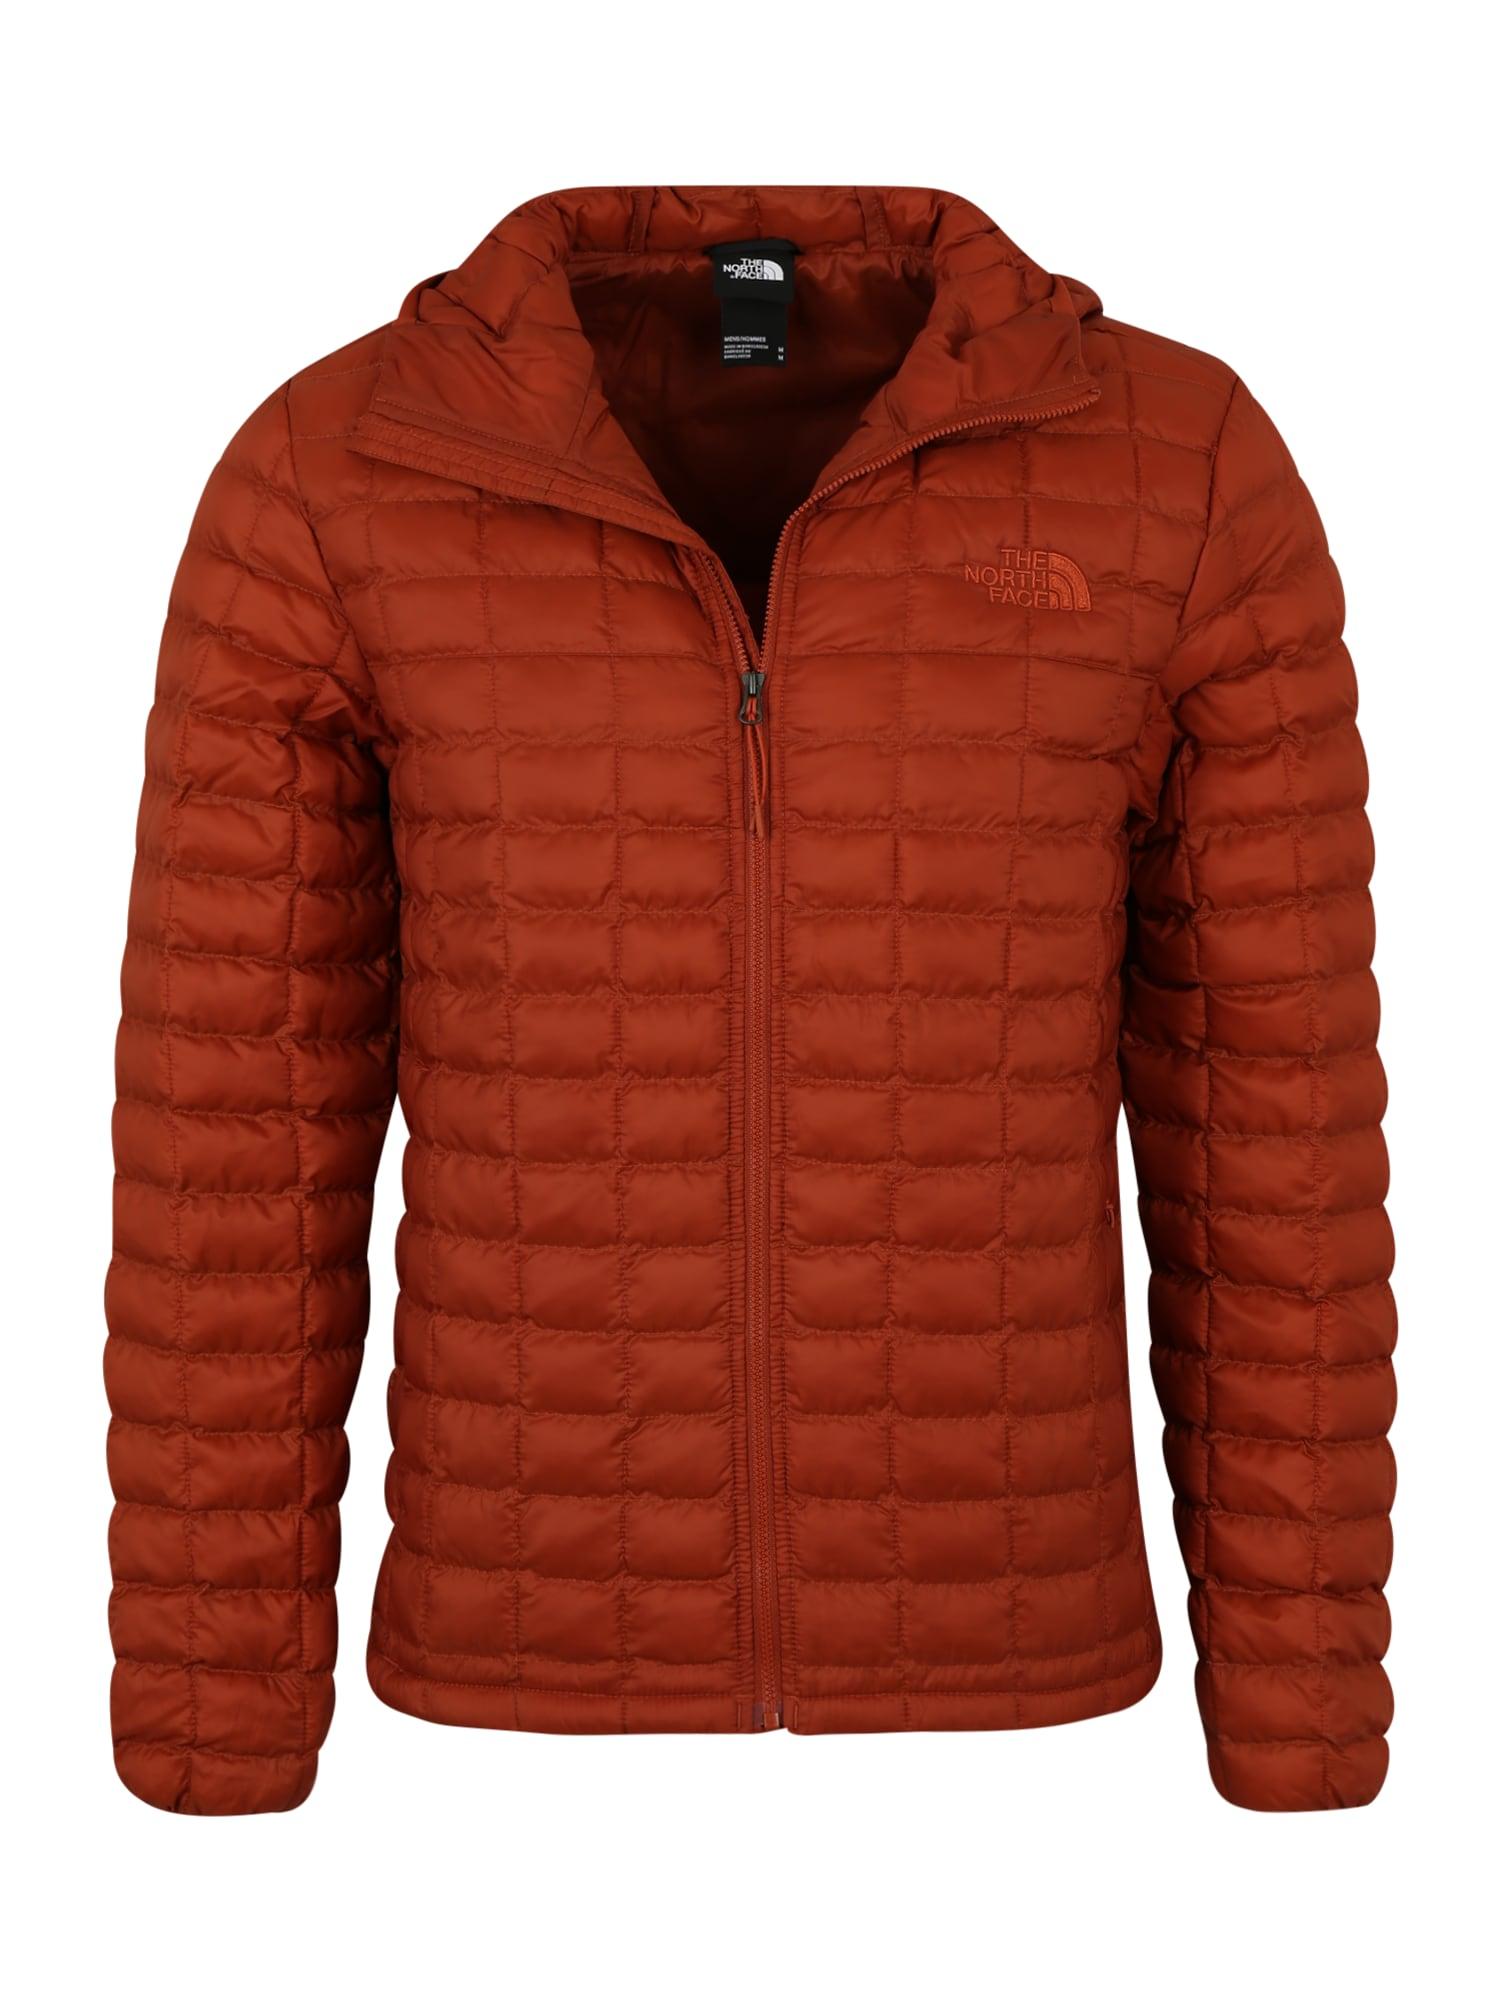 THE NORTH FACE Kültéri kabátok  piros